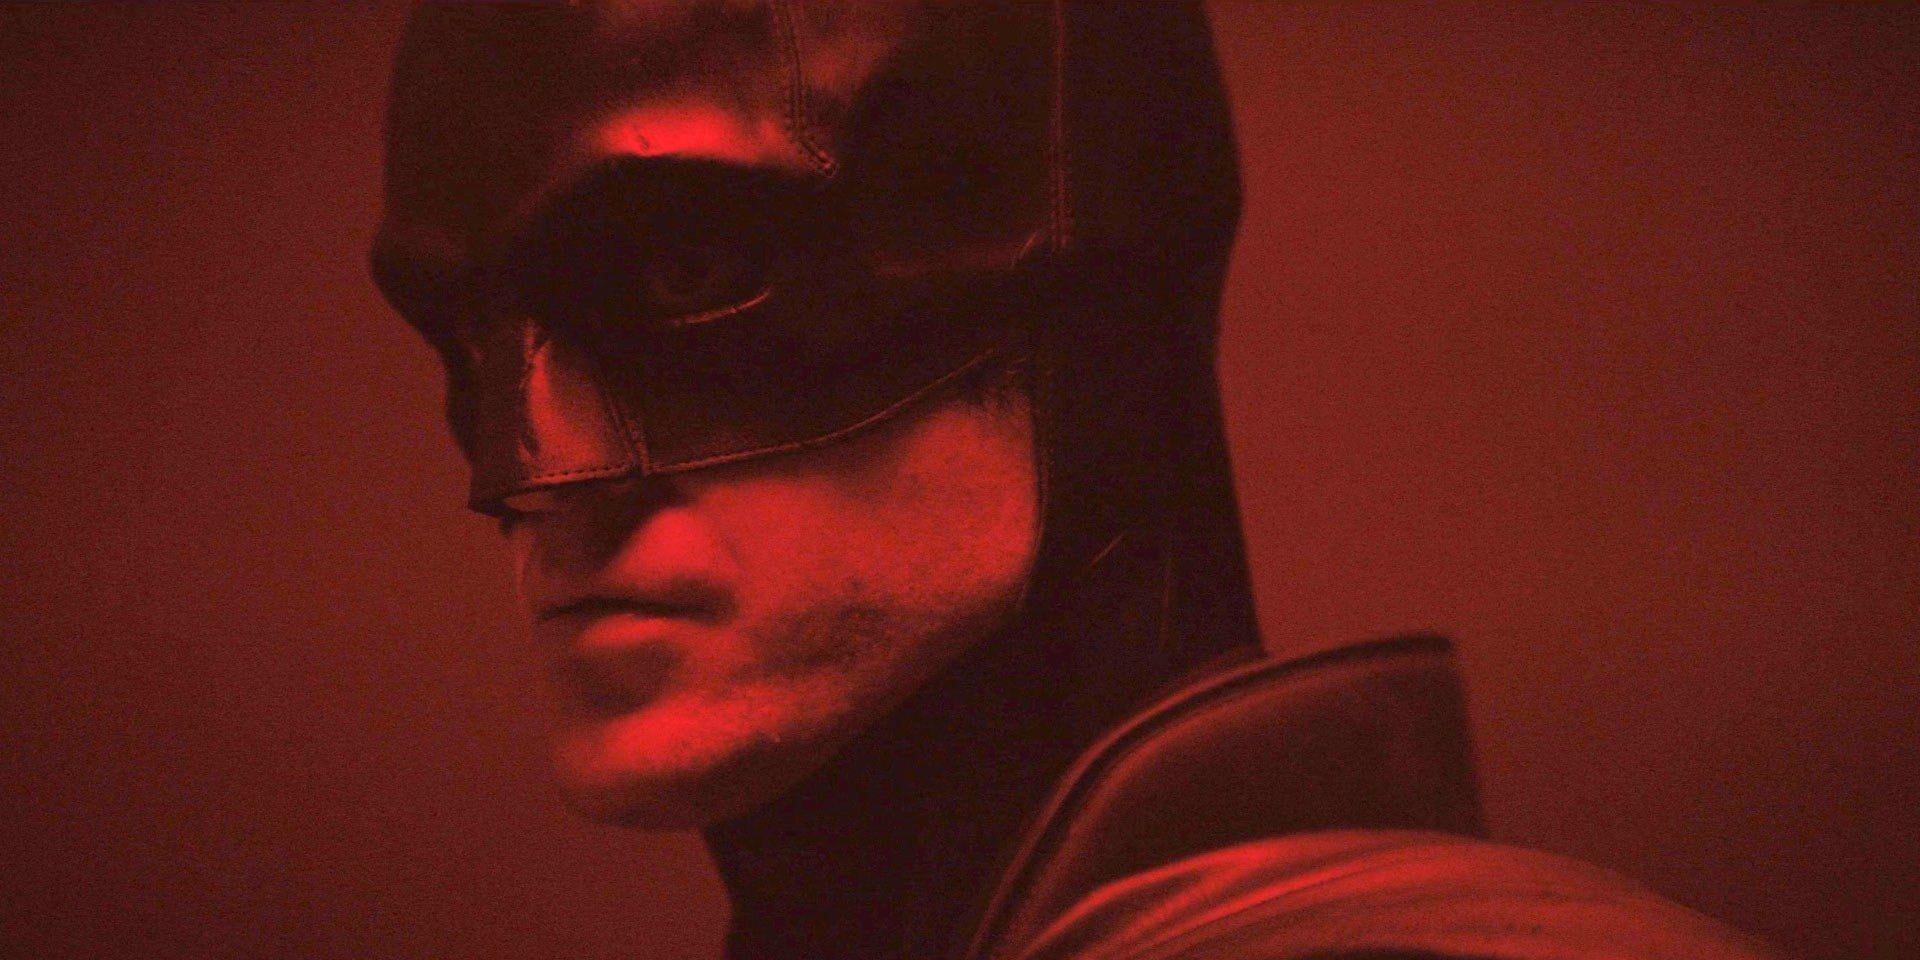 Batman: Robert Pattinson's Full Batsuit & Batcycle Revealed In Photos